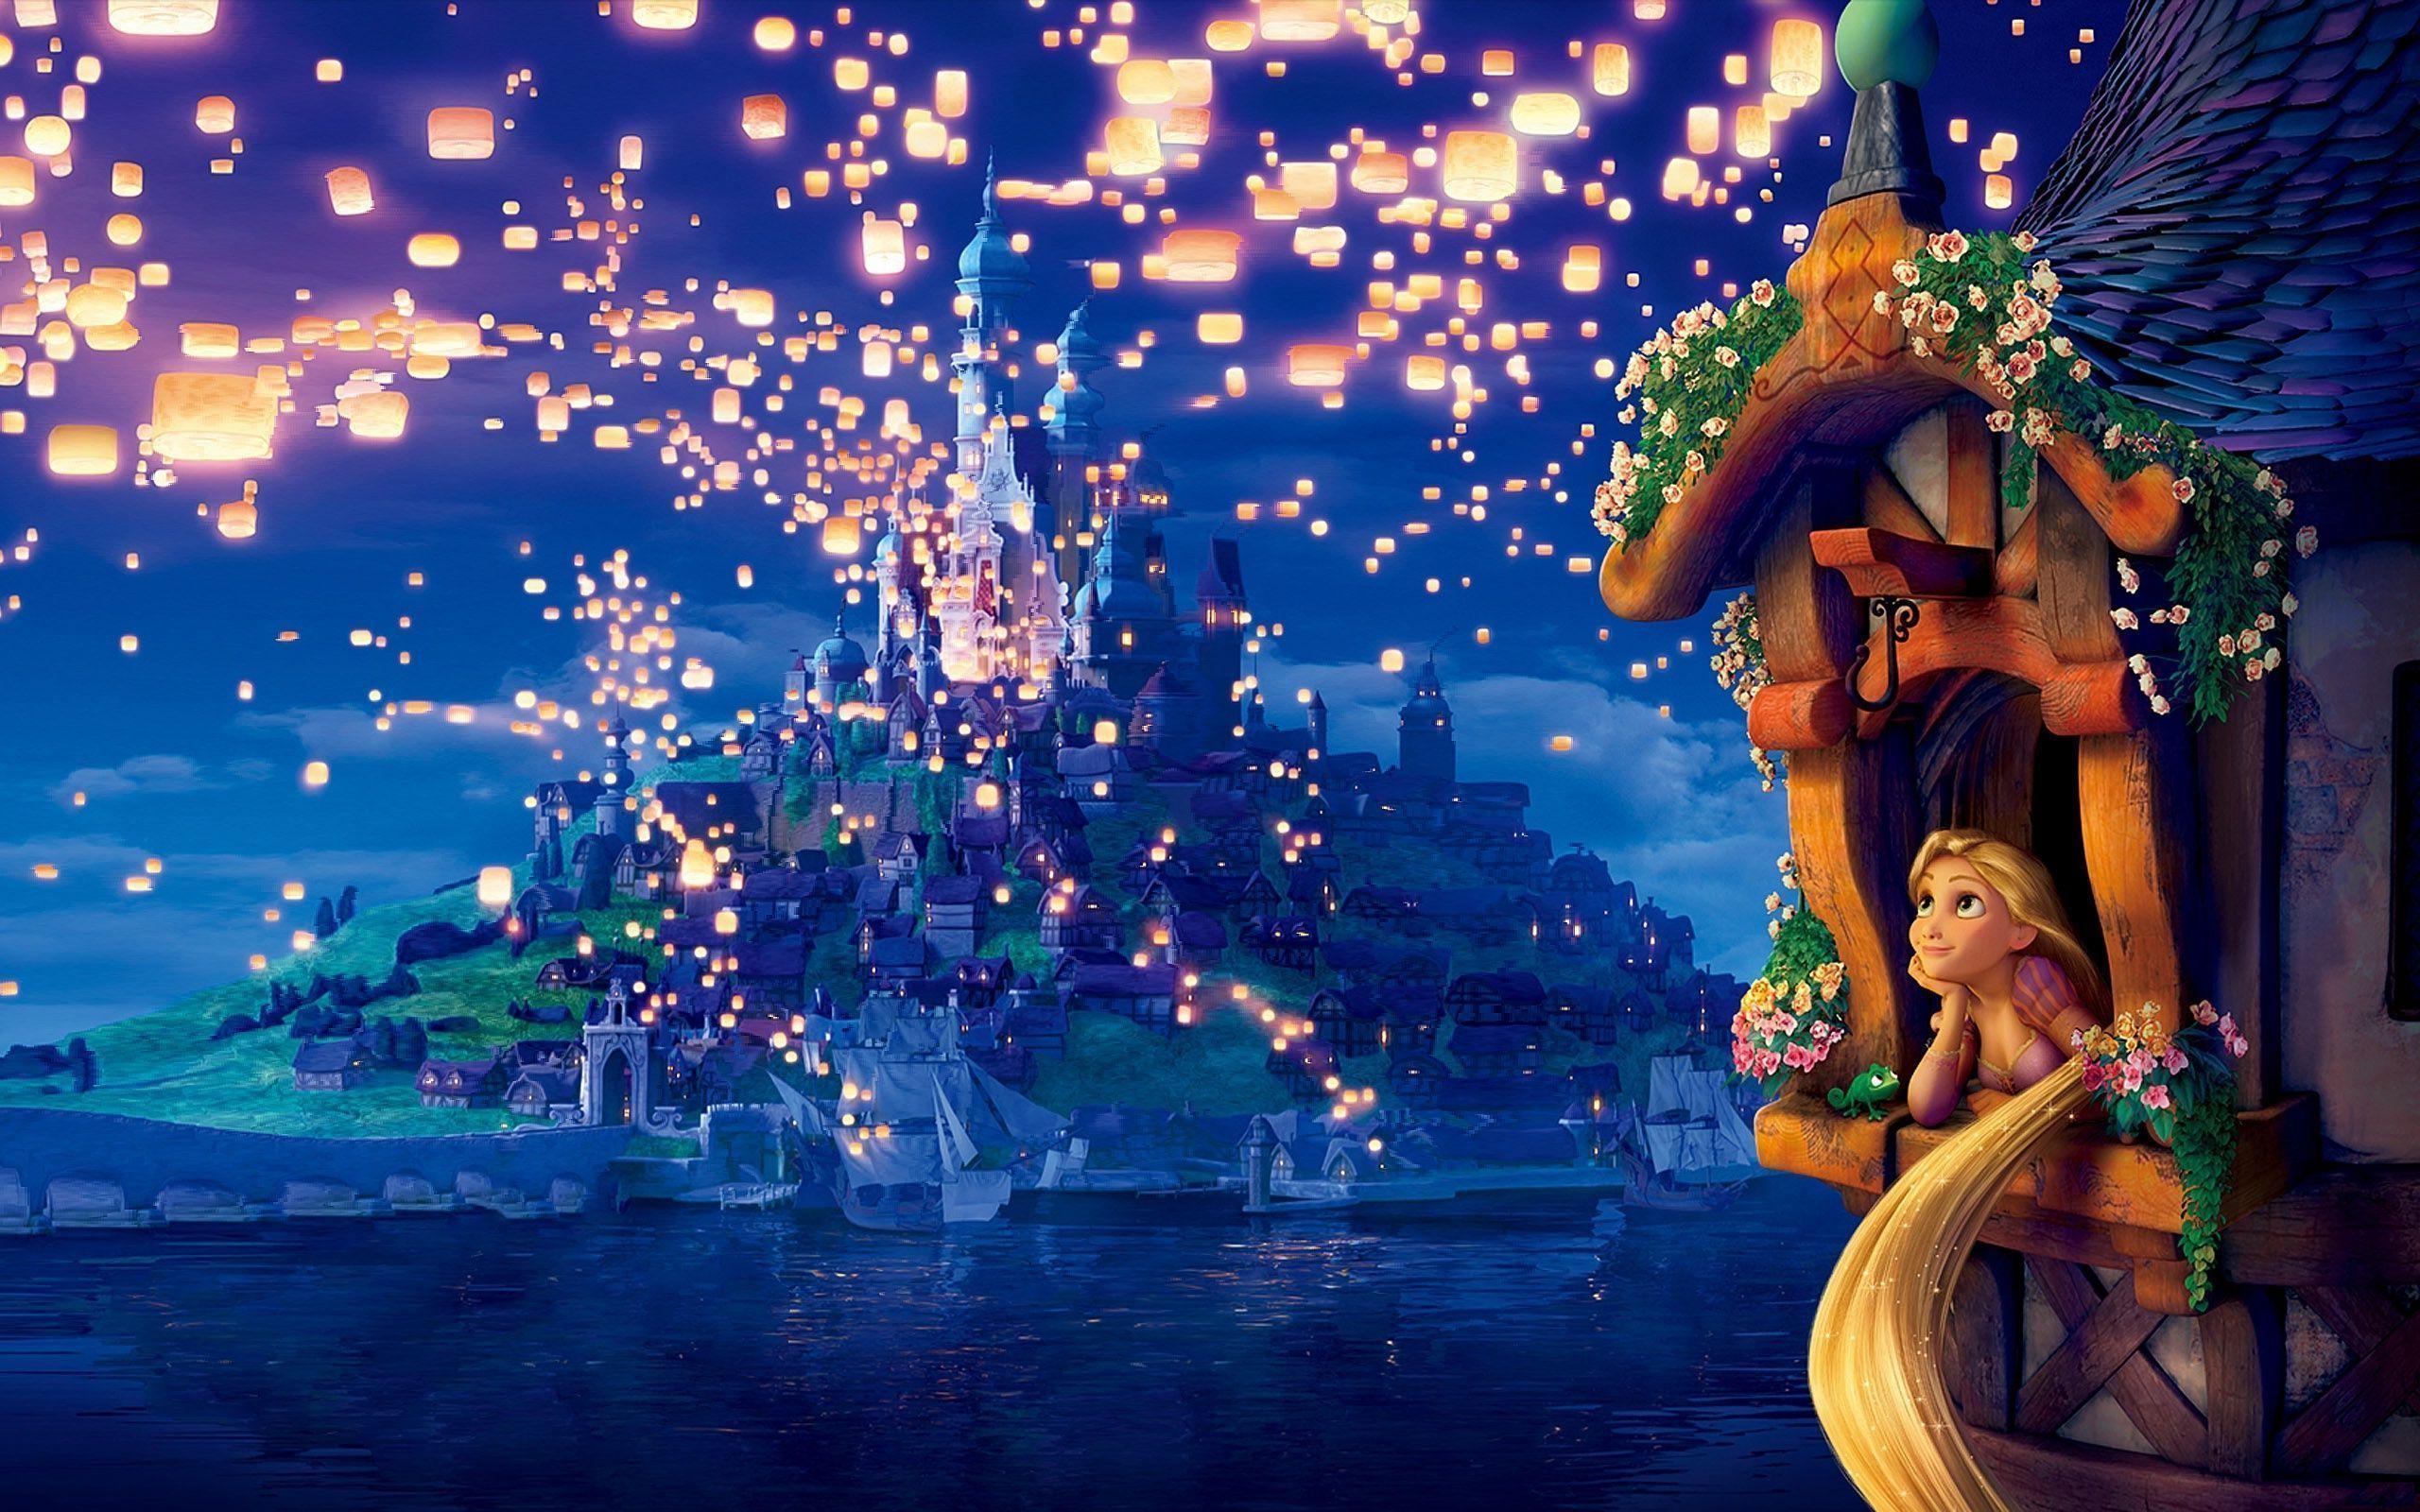 Disney Rapunzel Wallpaper Border 14016 Full HD Wallpaper Desktop ...